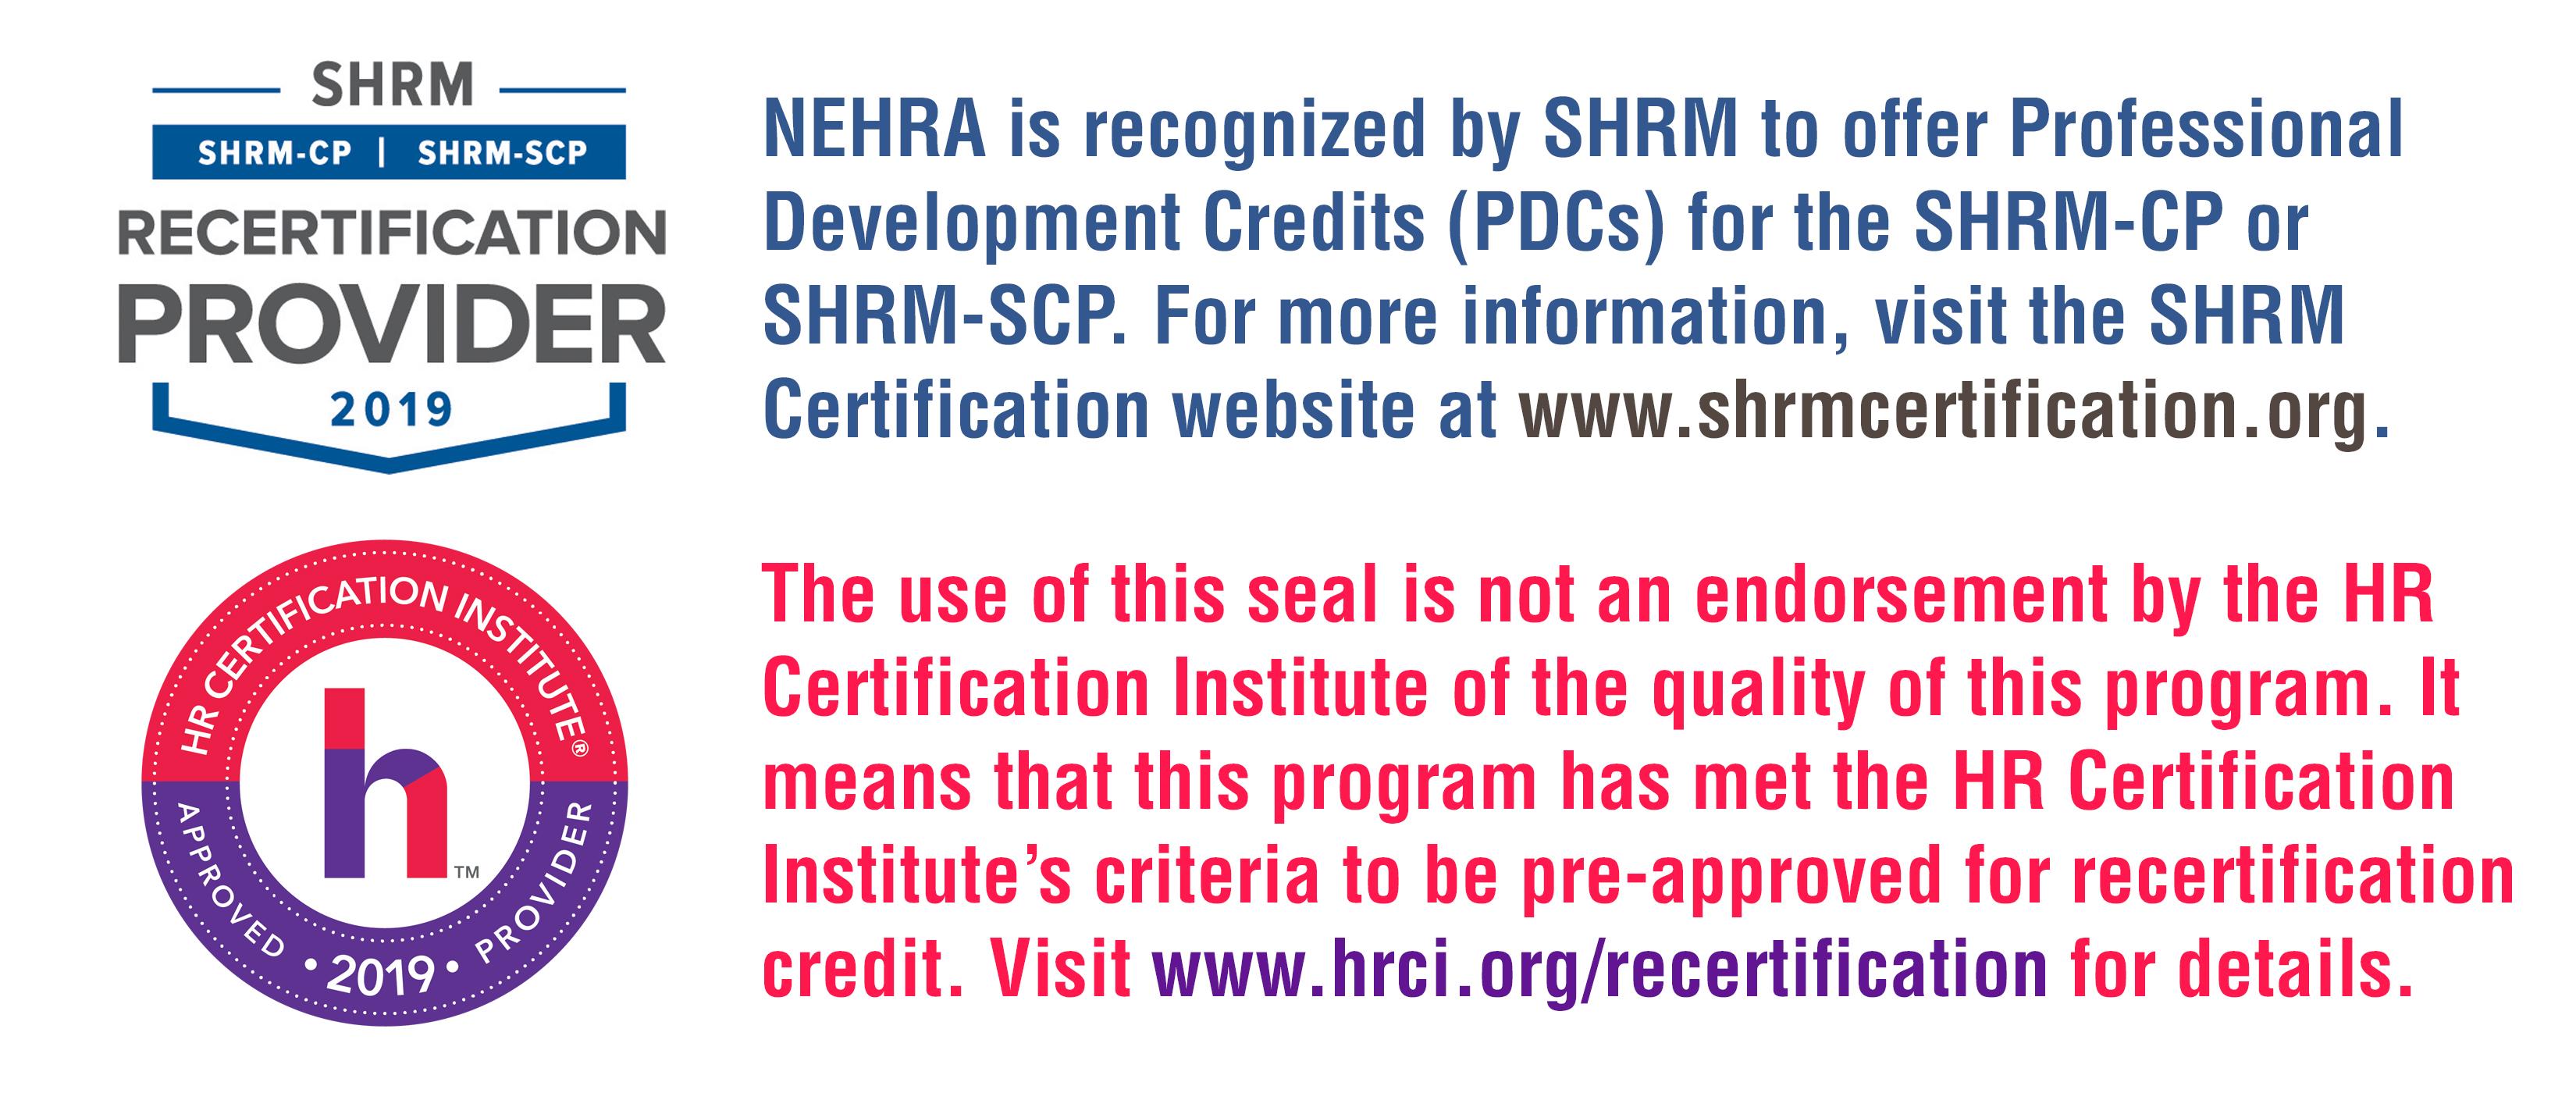 HRCI and SHRM Disclaimer 2019